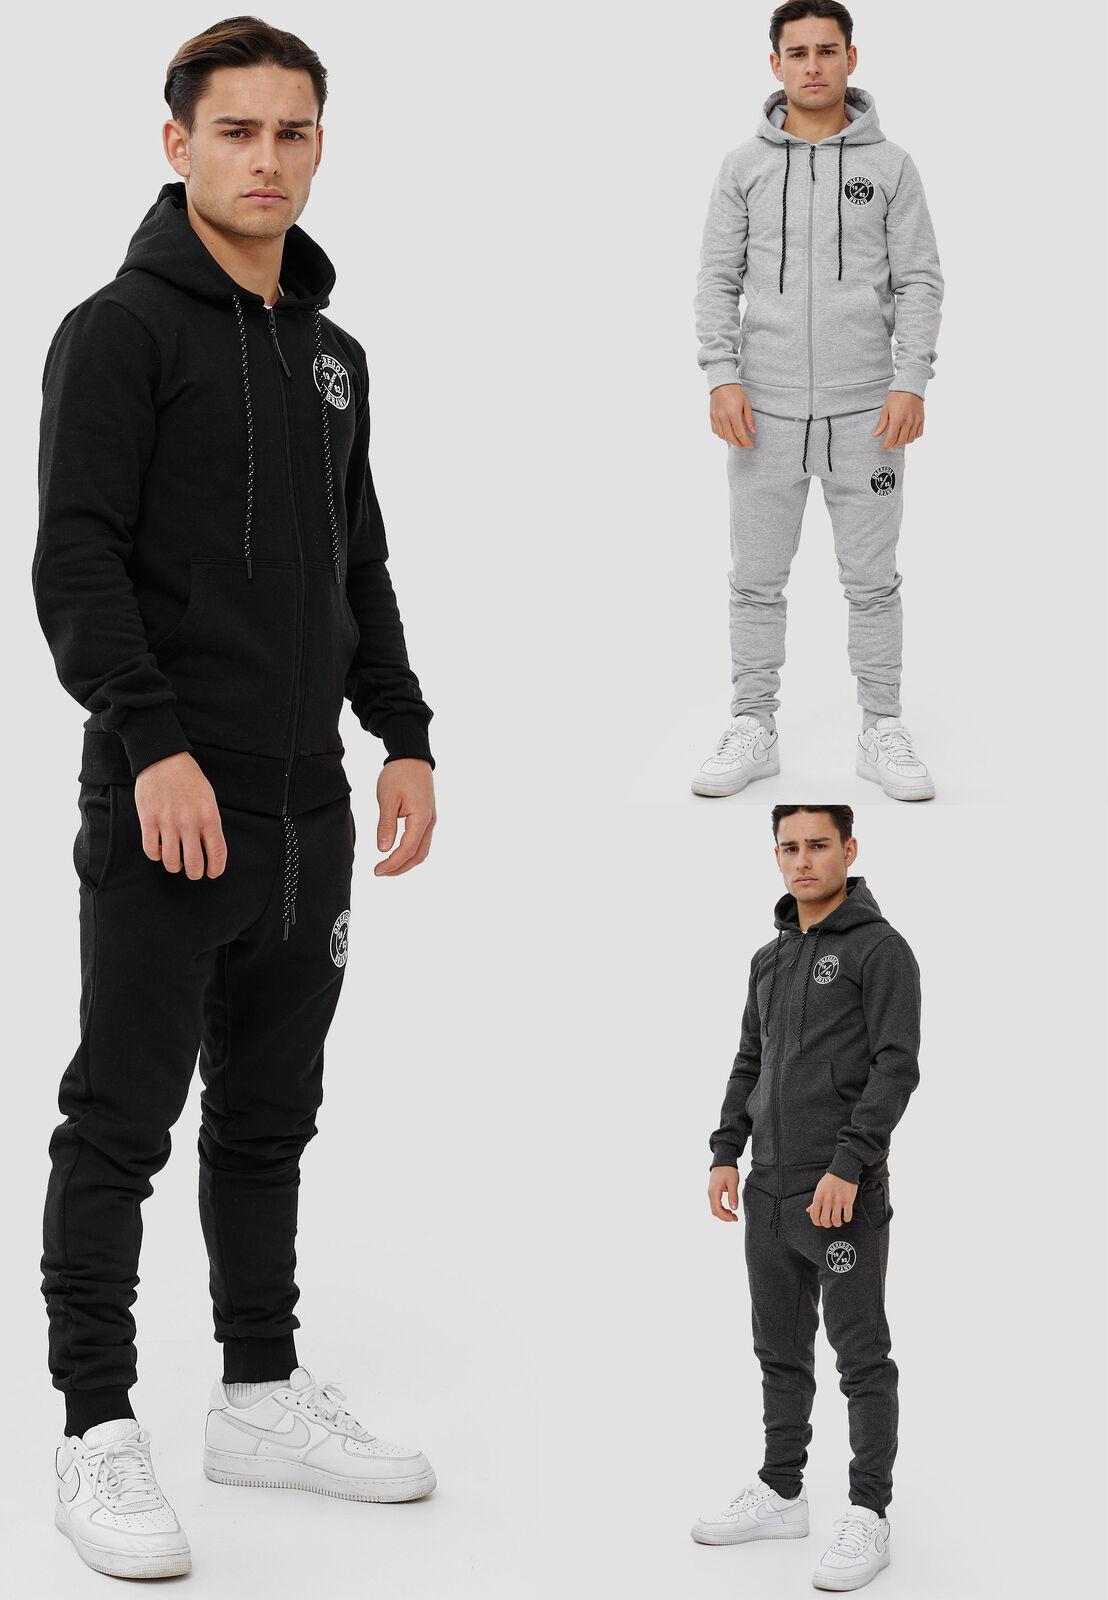 Jogging Tracksuit Trackies Fitness Jogger Streetwear Mens